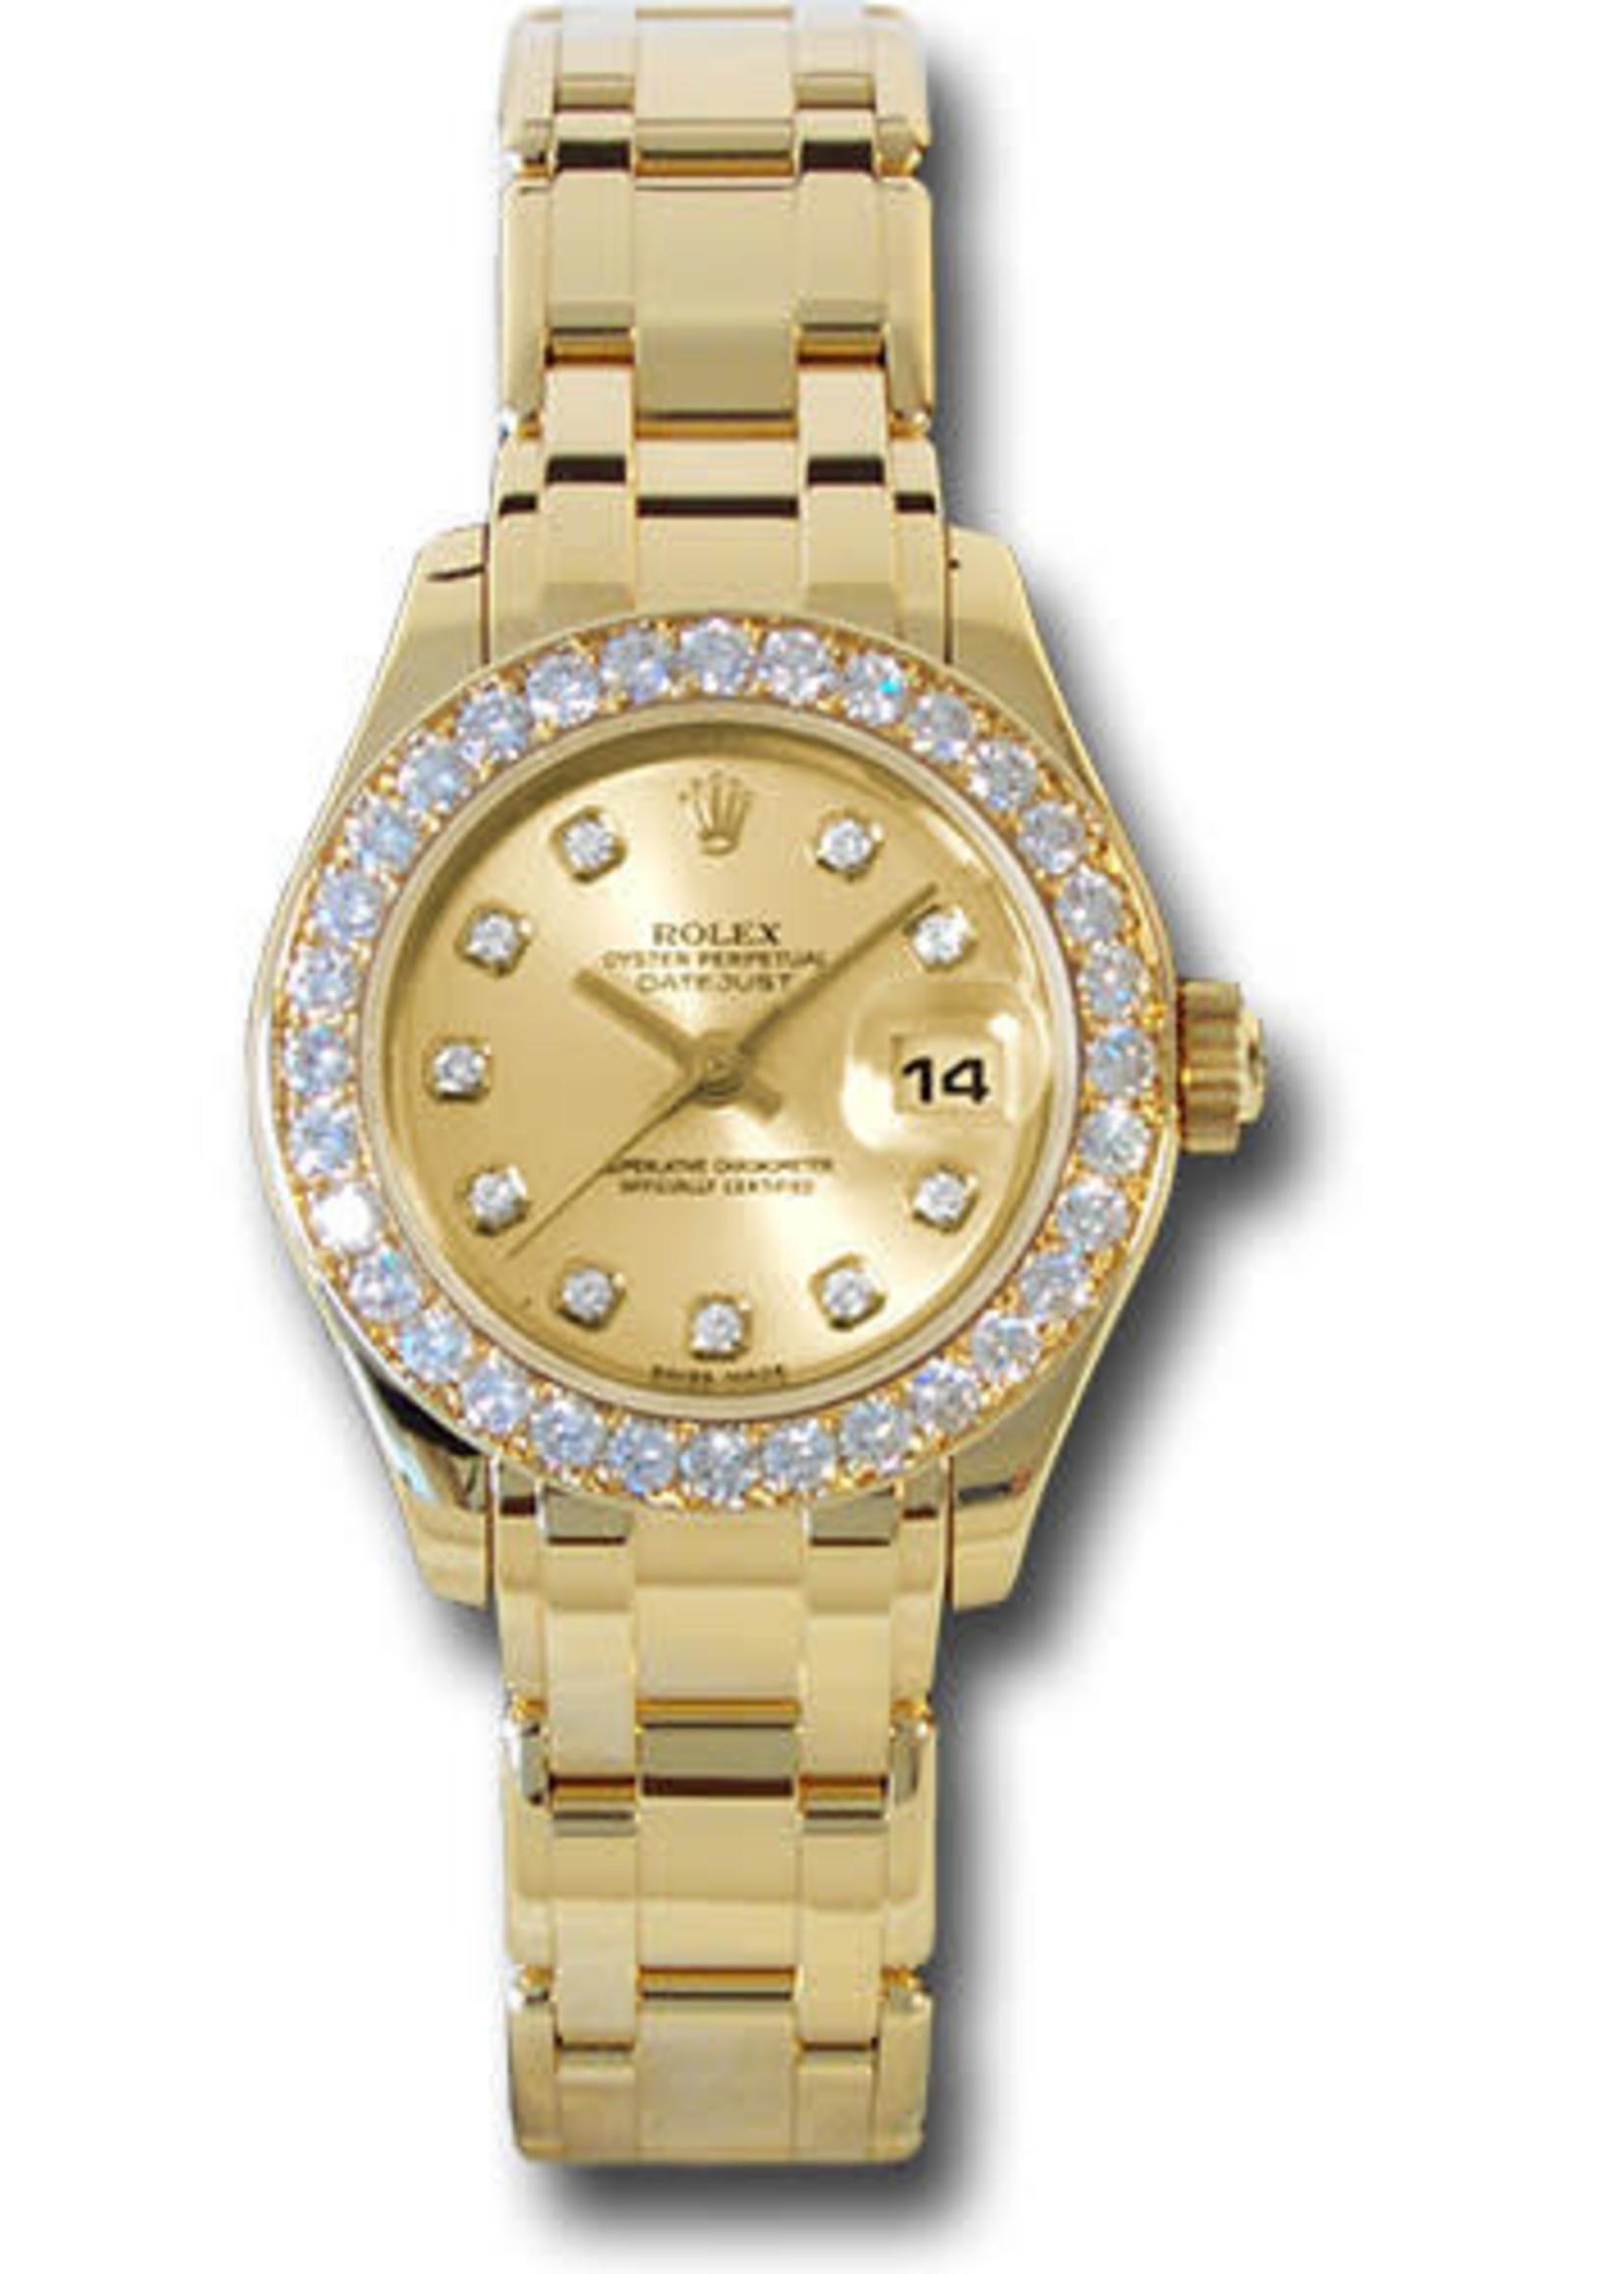 Rolex ROLEX DATEJUST PEARLMASTER 29MM (2000) #80318